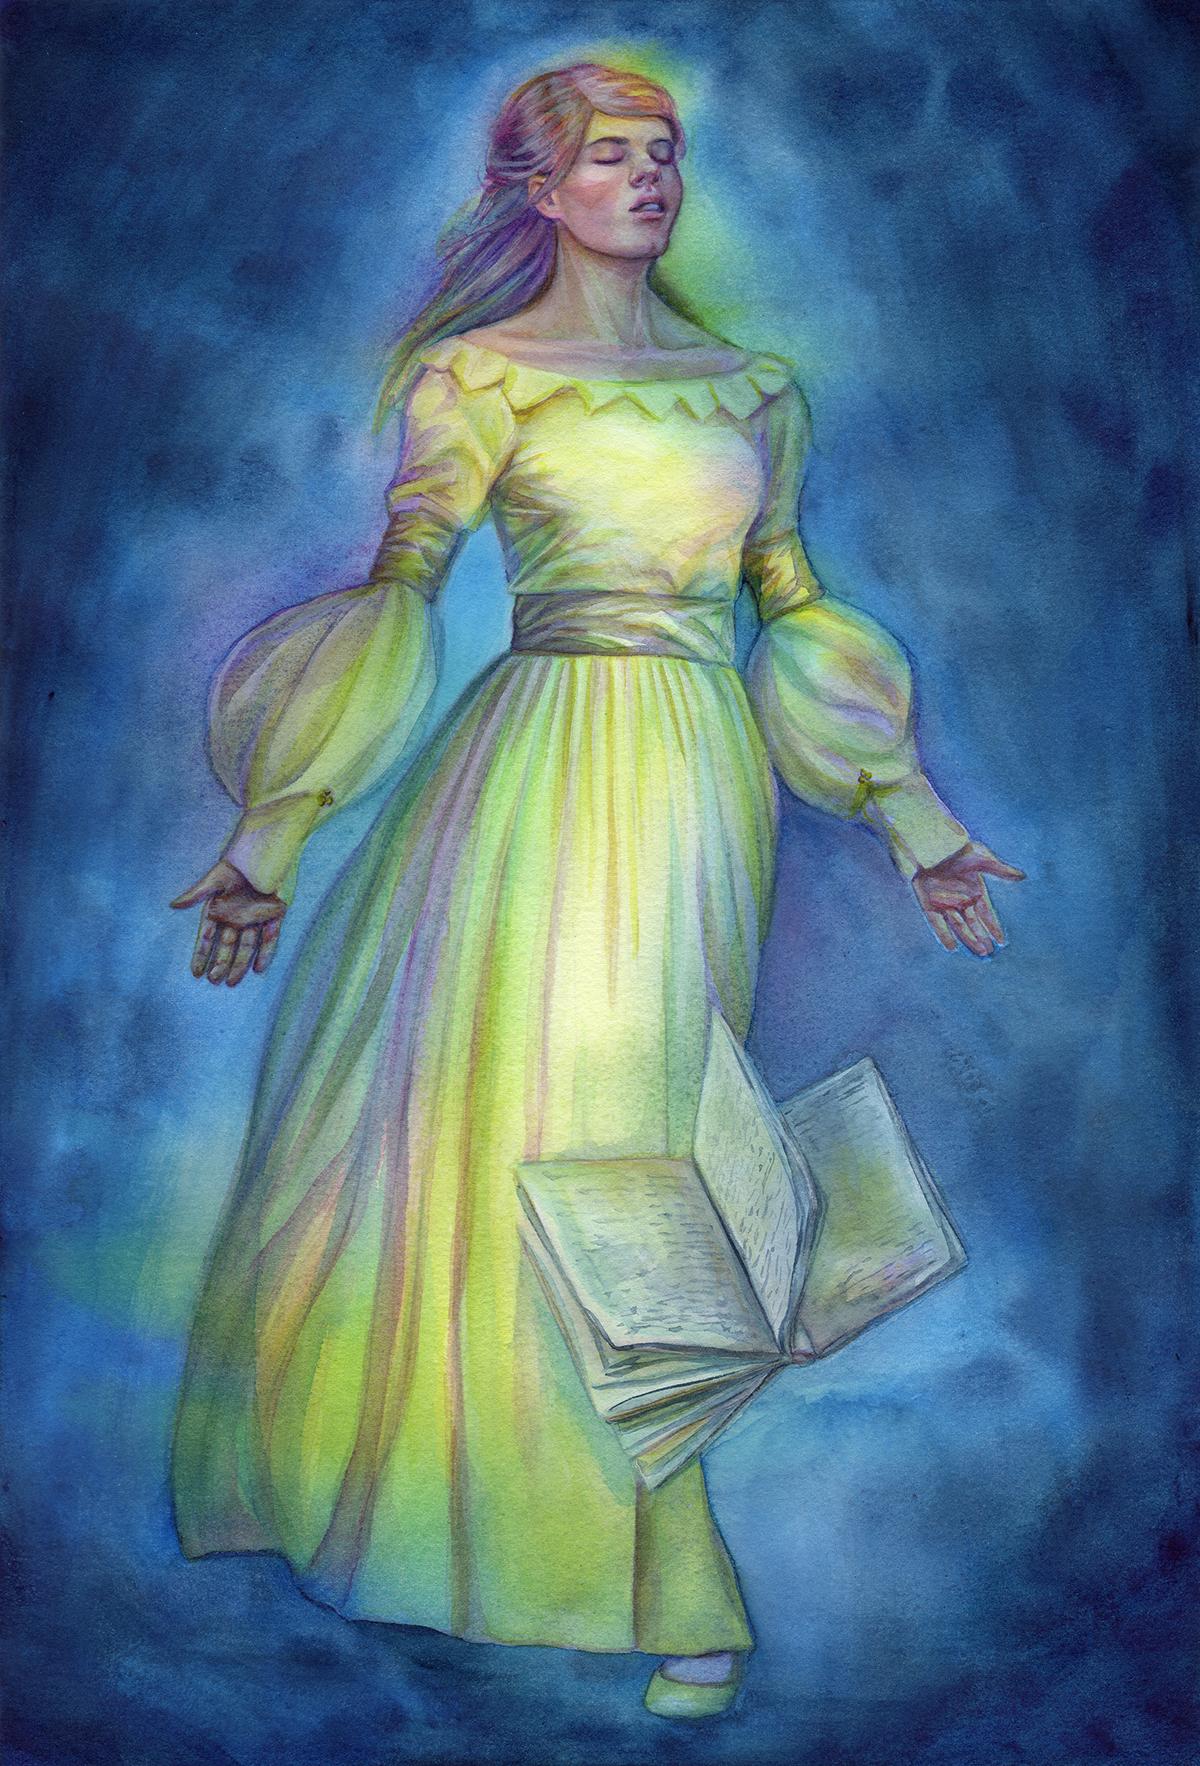 "Truth - Watercolour - 11.69 x 16.55'"" - $495"